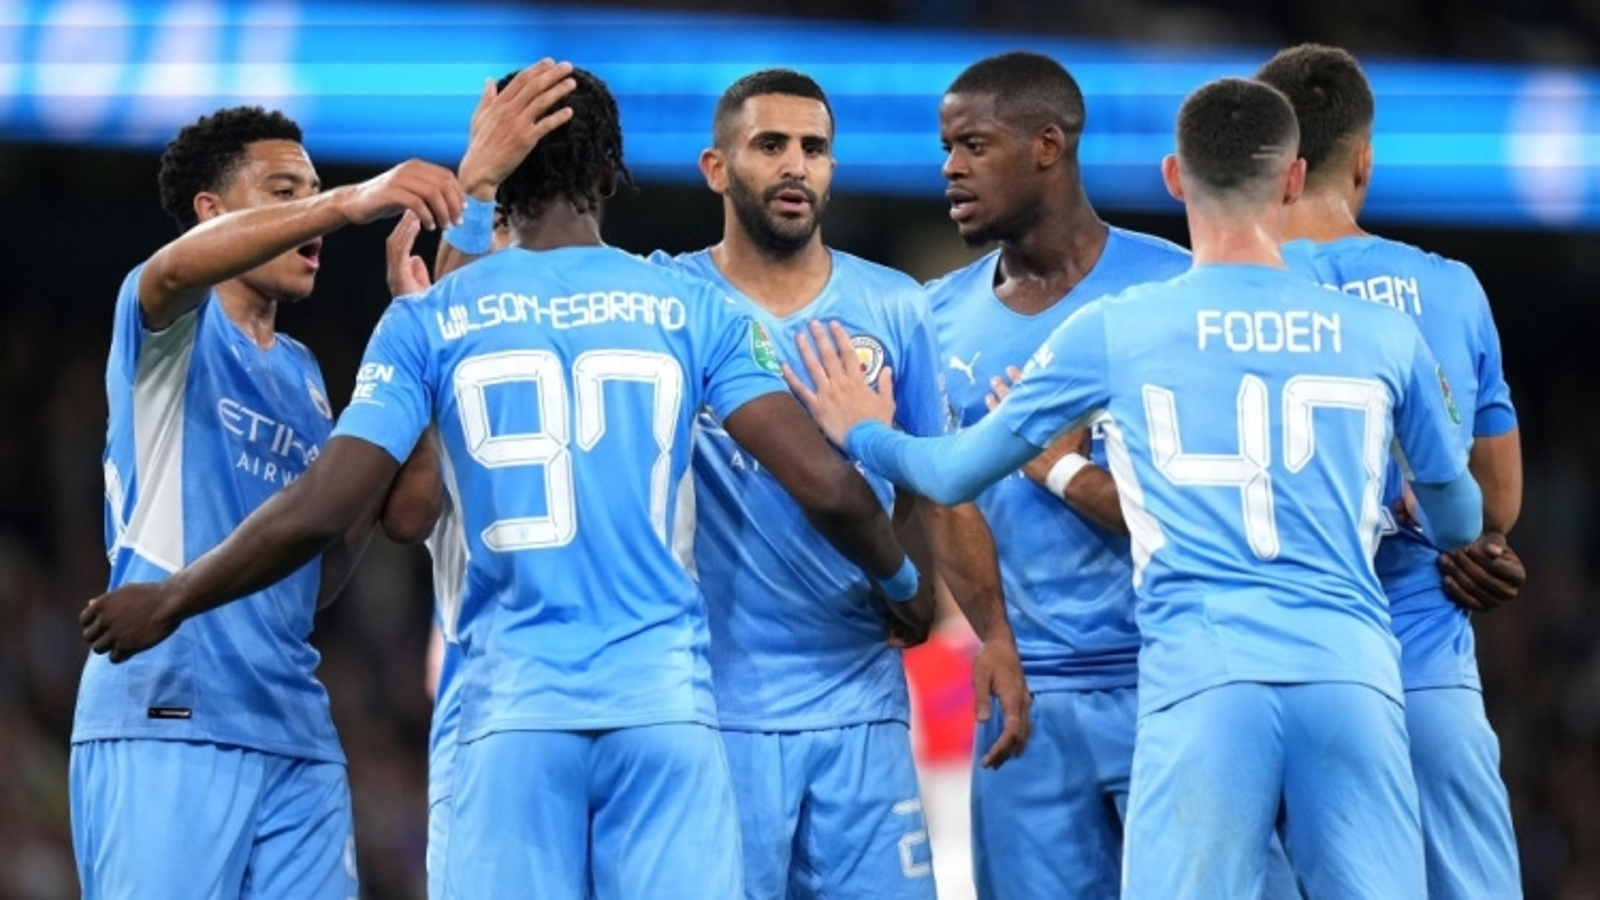 Vòng 3 League Cup: Man City thắng 6-1 Wycombe, Brentford gây sốc với chiến thắng 7-0